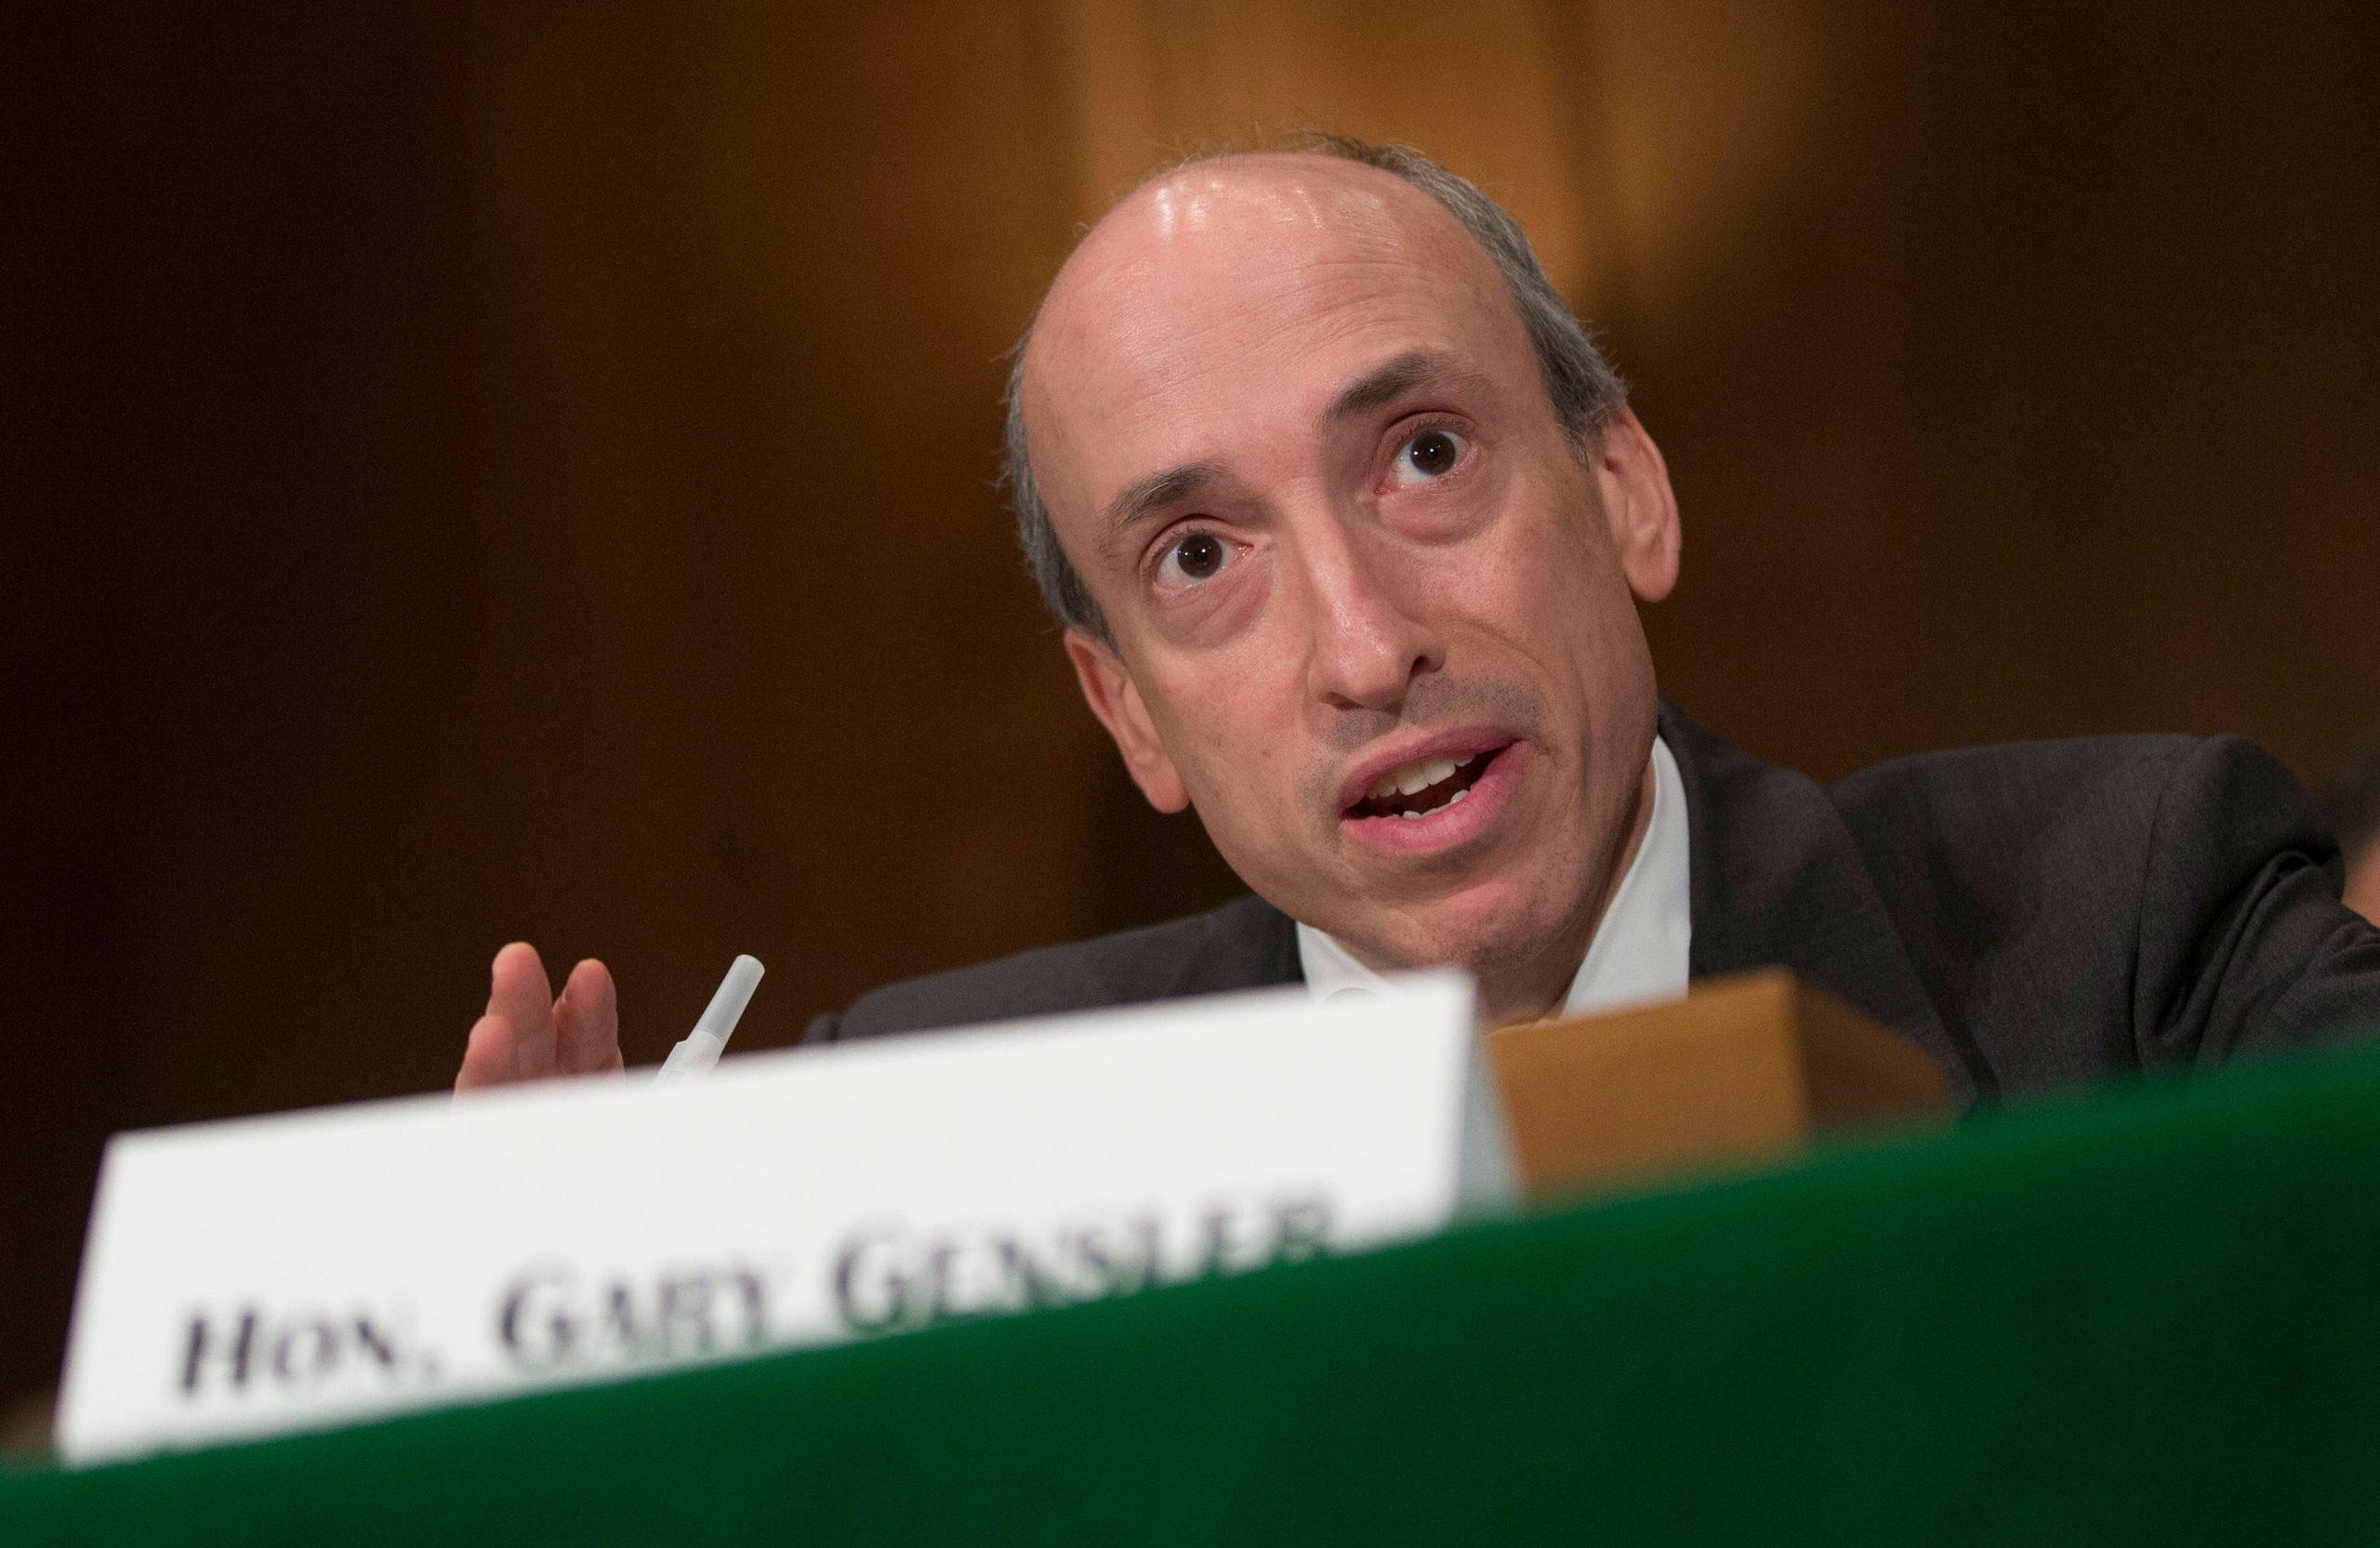 Gary Gensler confirmed by Senate to lead the SEC, Wall Street's top regulator